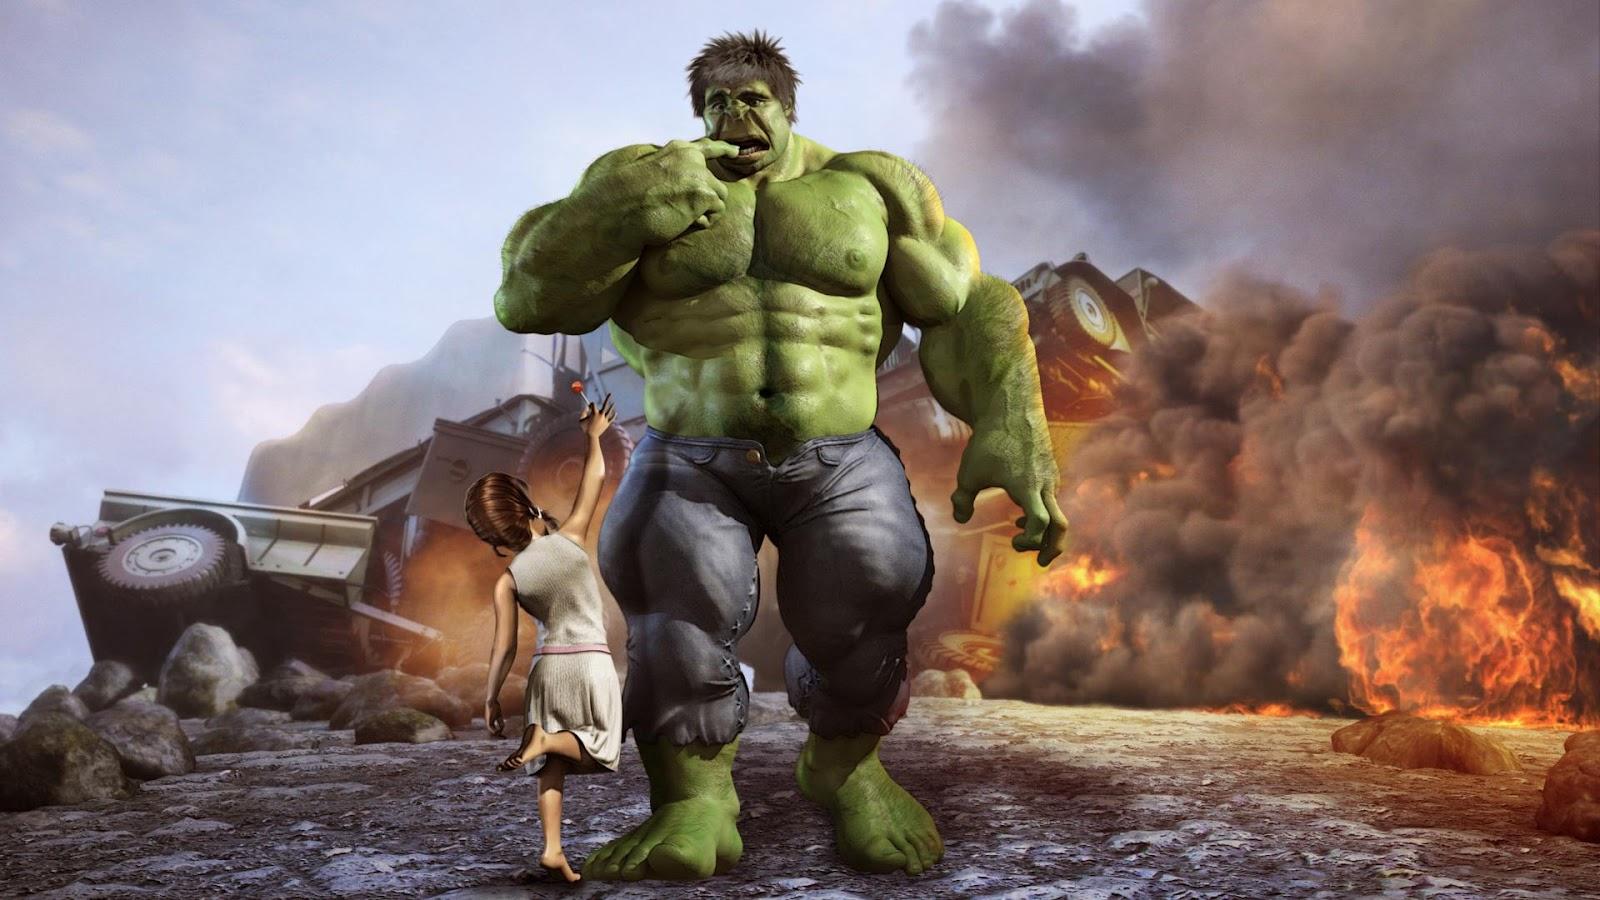 http://3.bp.blogspot.com/-9PnWnafTRIY/UBChr9EC2_I/AAAAAAAABt8/TziFpzWqilM/s1600/Hulk+Wallpapers+5.jpg